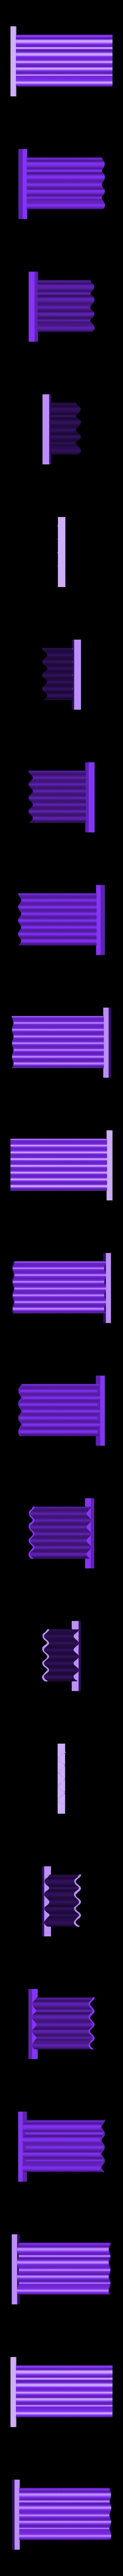 door_curtain1.stl Download free STL file The Crannog • 3D printable template, Earsling